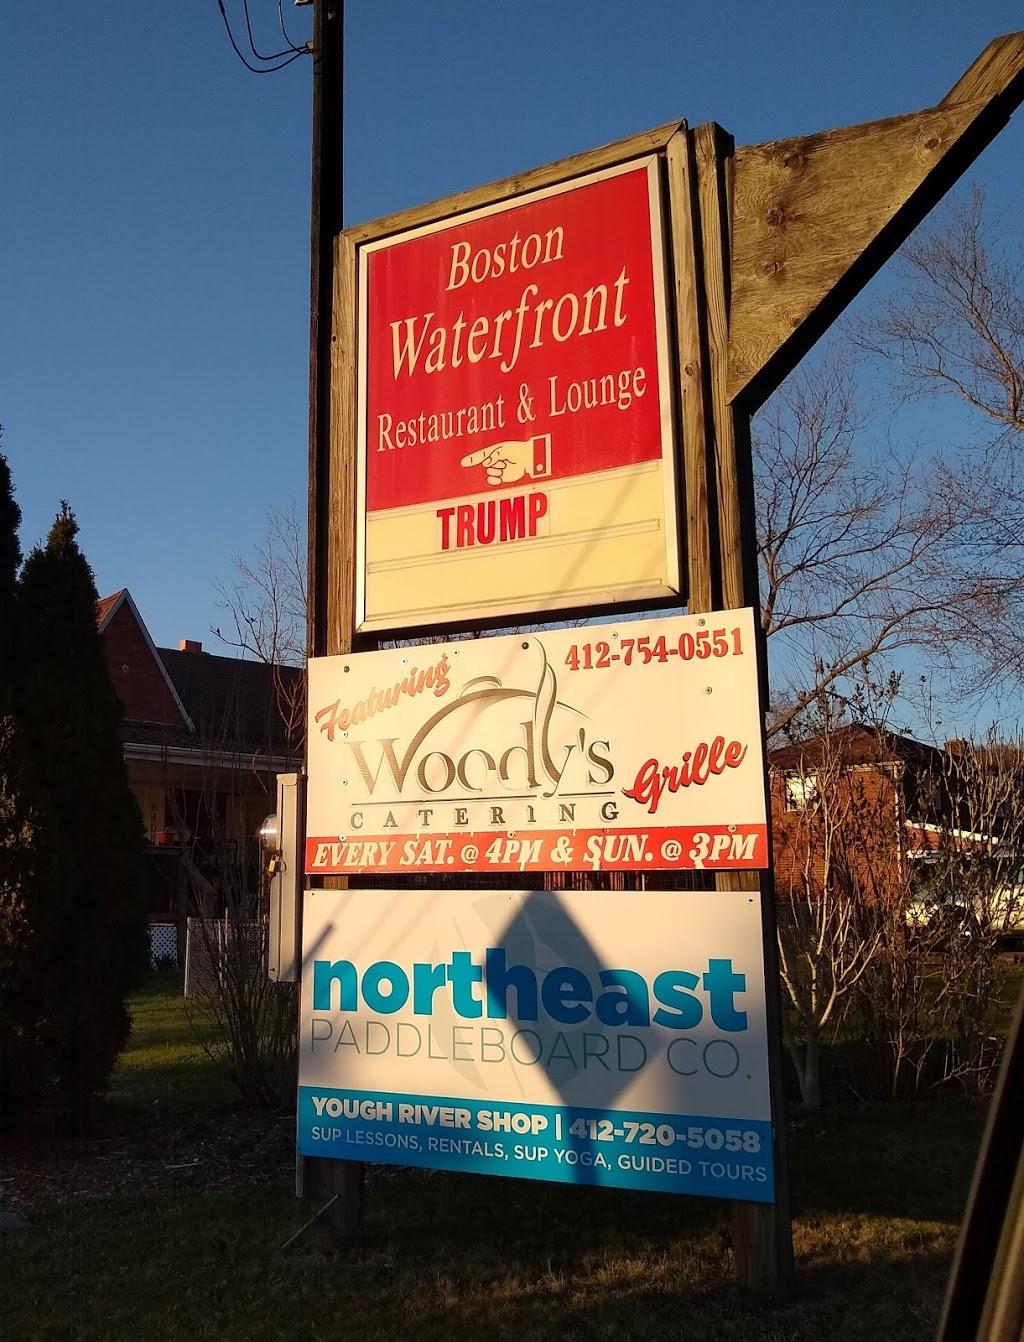 Boston Waterfront Restaurant | restaurant | 6401 Smithfield St, McKeesport, PA 15135, USA